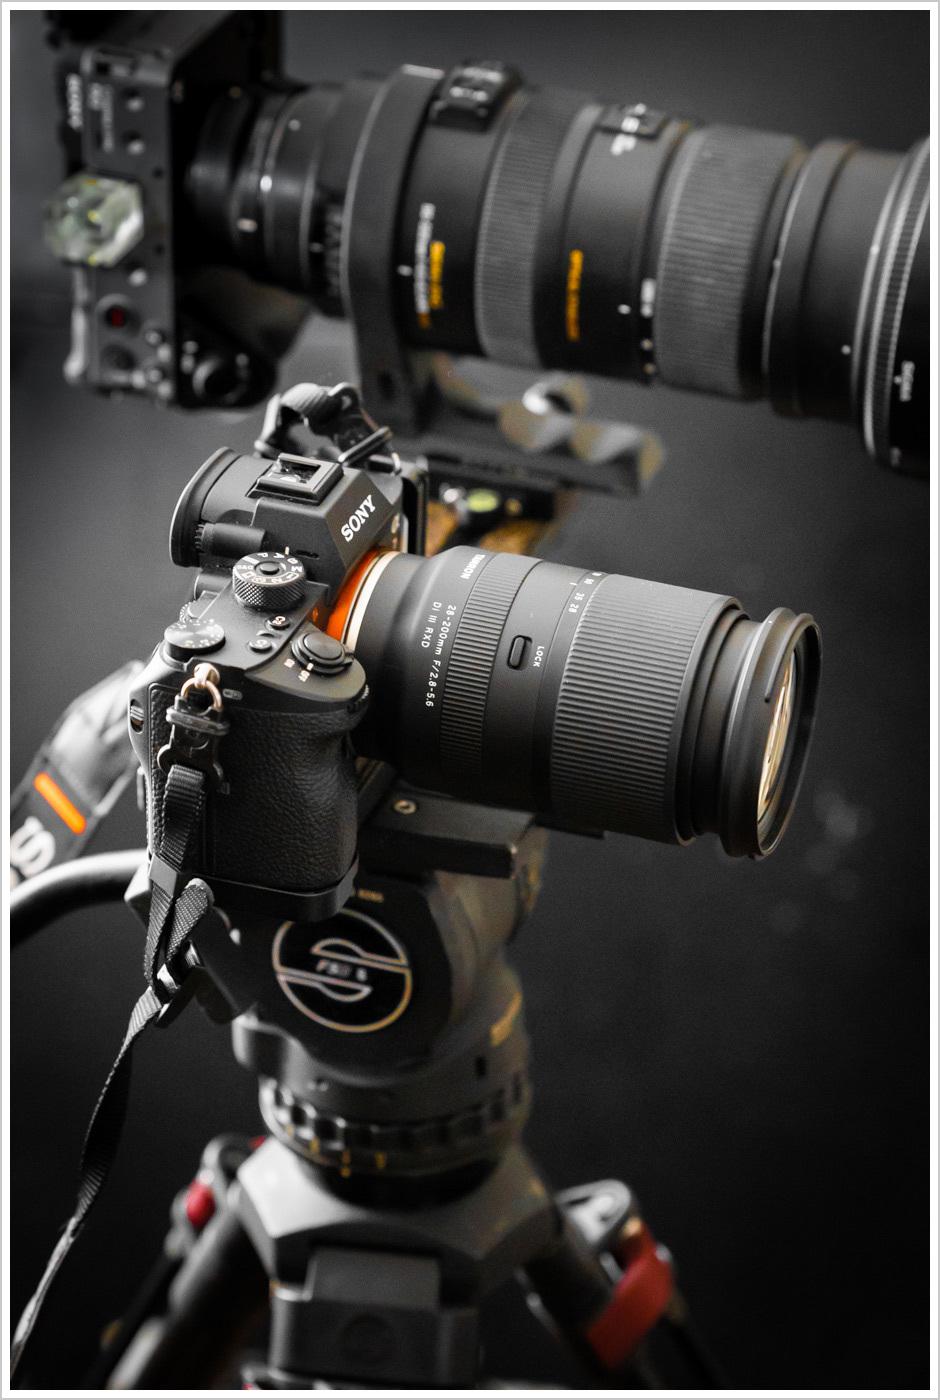 TAMRON 28-200mm F2.8-5.6 DiIII RXD(A071SF)_d0104052_08413303.jpg